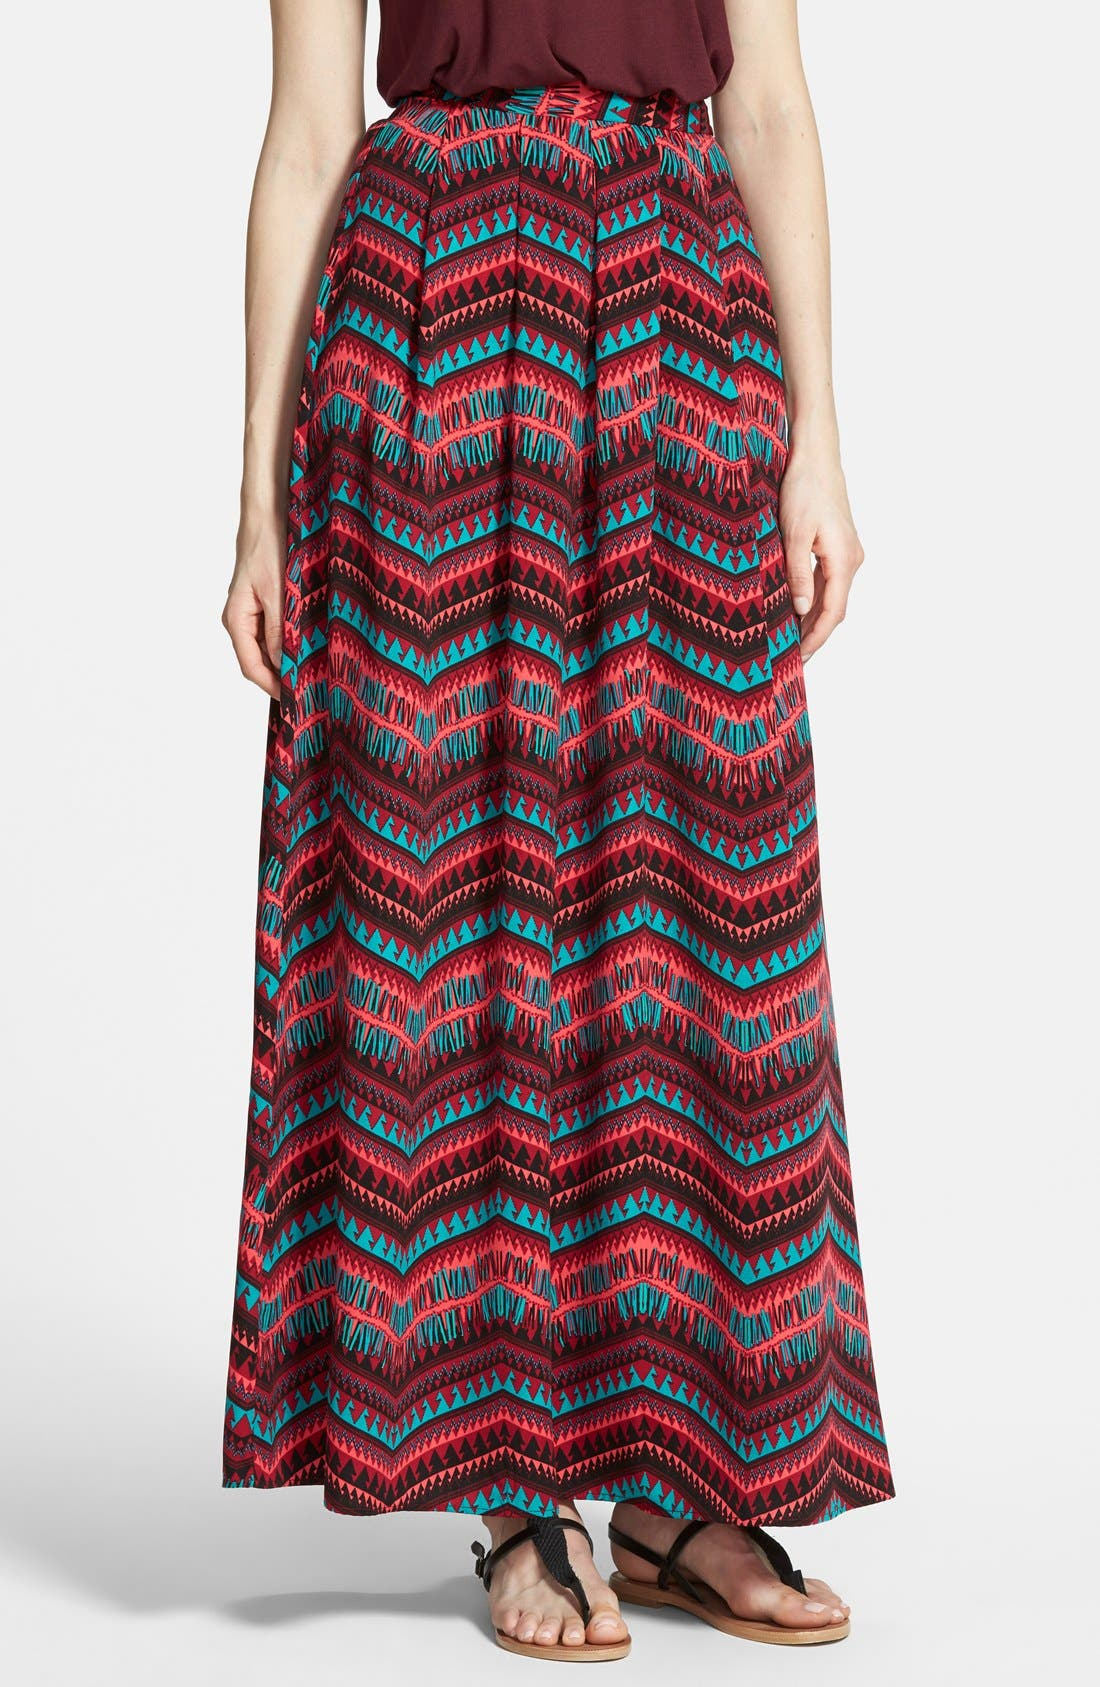 Alternate Image 1 Selected - Painted Threads Pleat Maxi Skirt (Juniors)